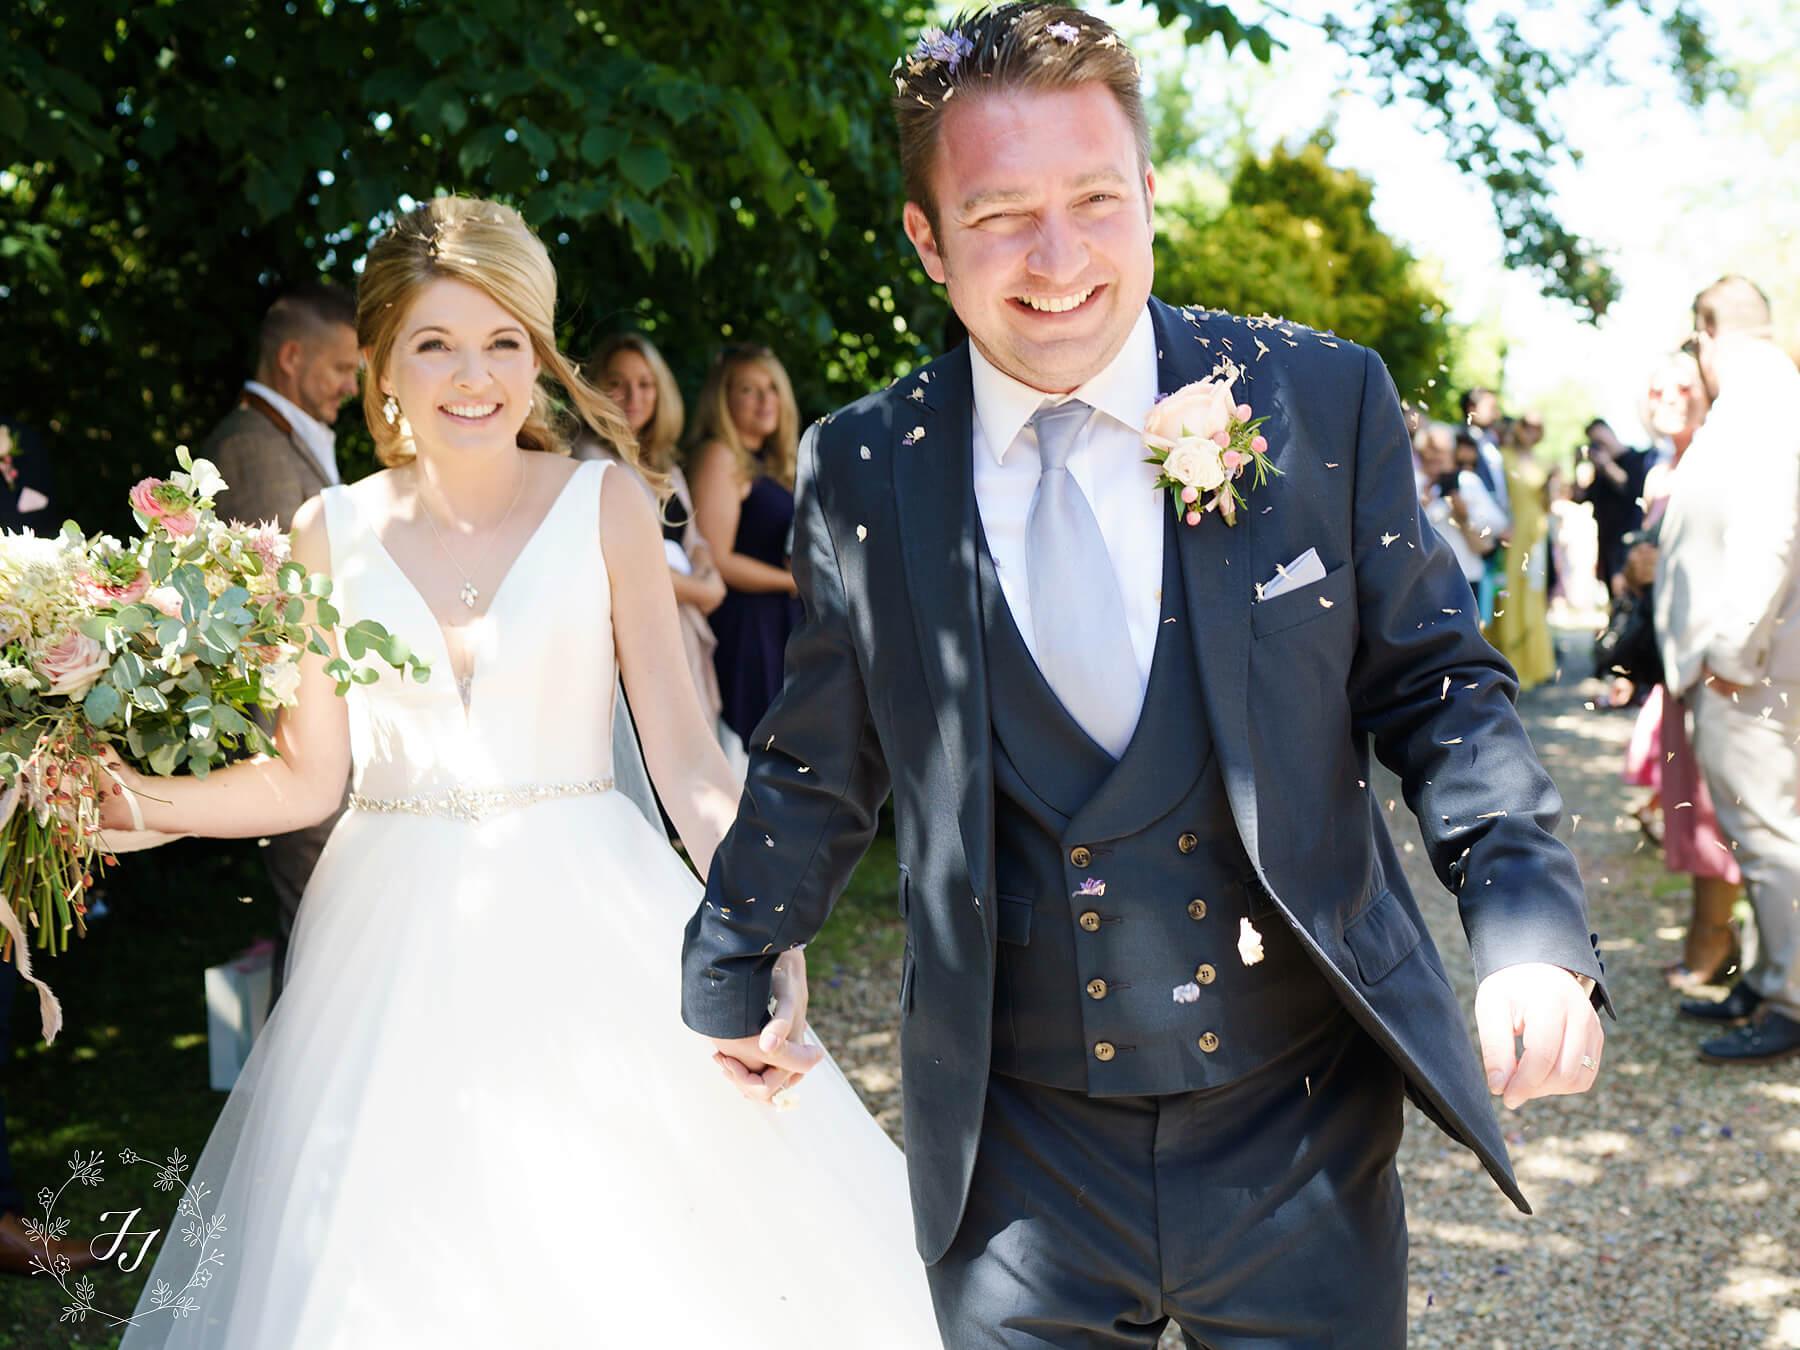 Victoria and Rickys wedding